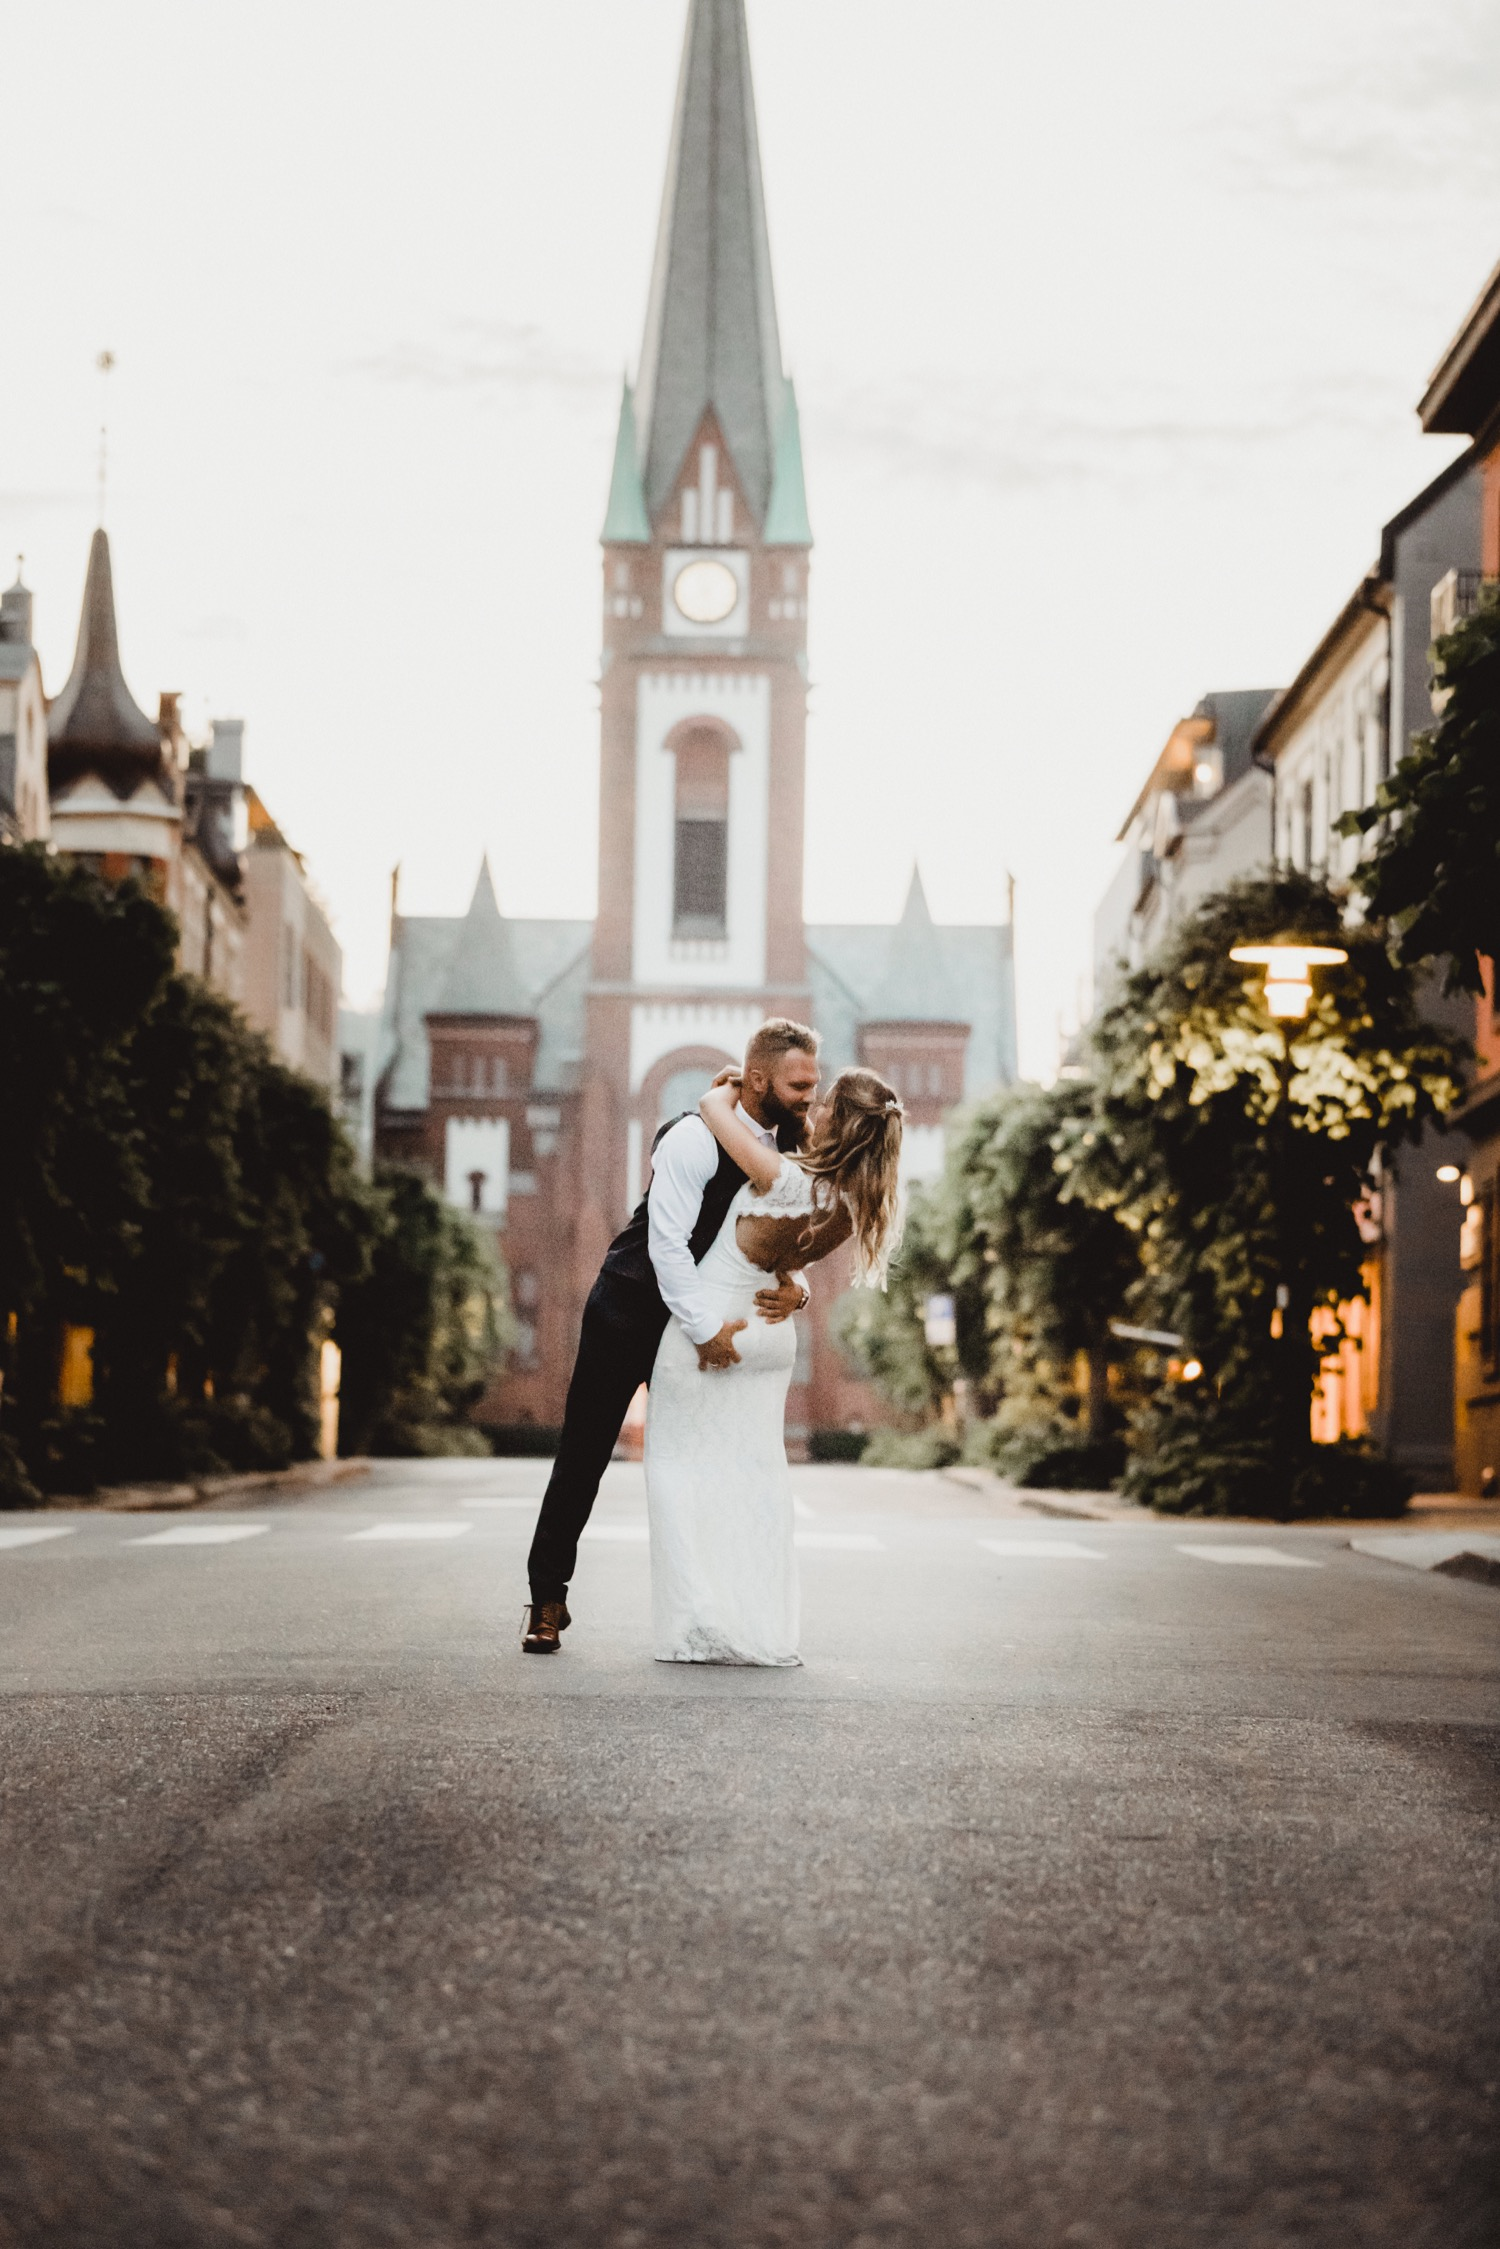 125_weddingphotographer_Bryllupsfotografering_Bryllupsbilder_fatmonkeyfoto_Bryllupsfotograf.jpg